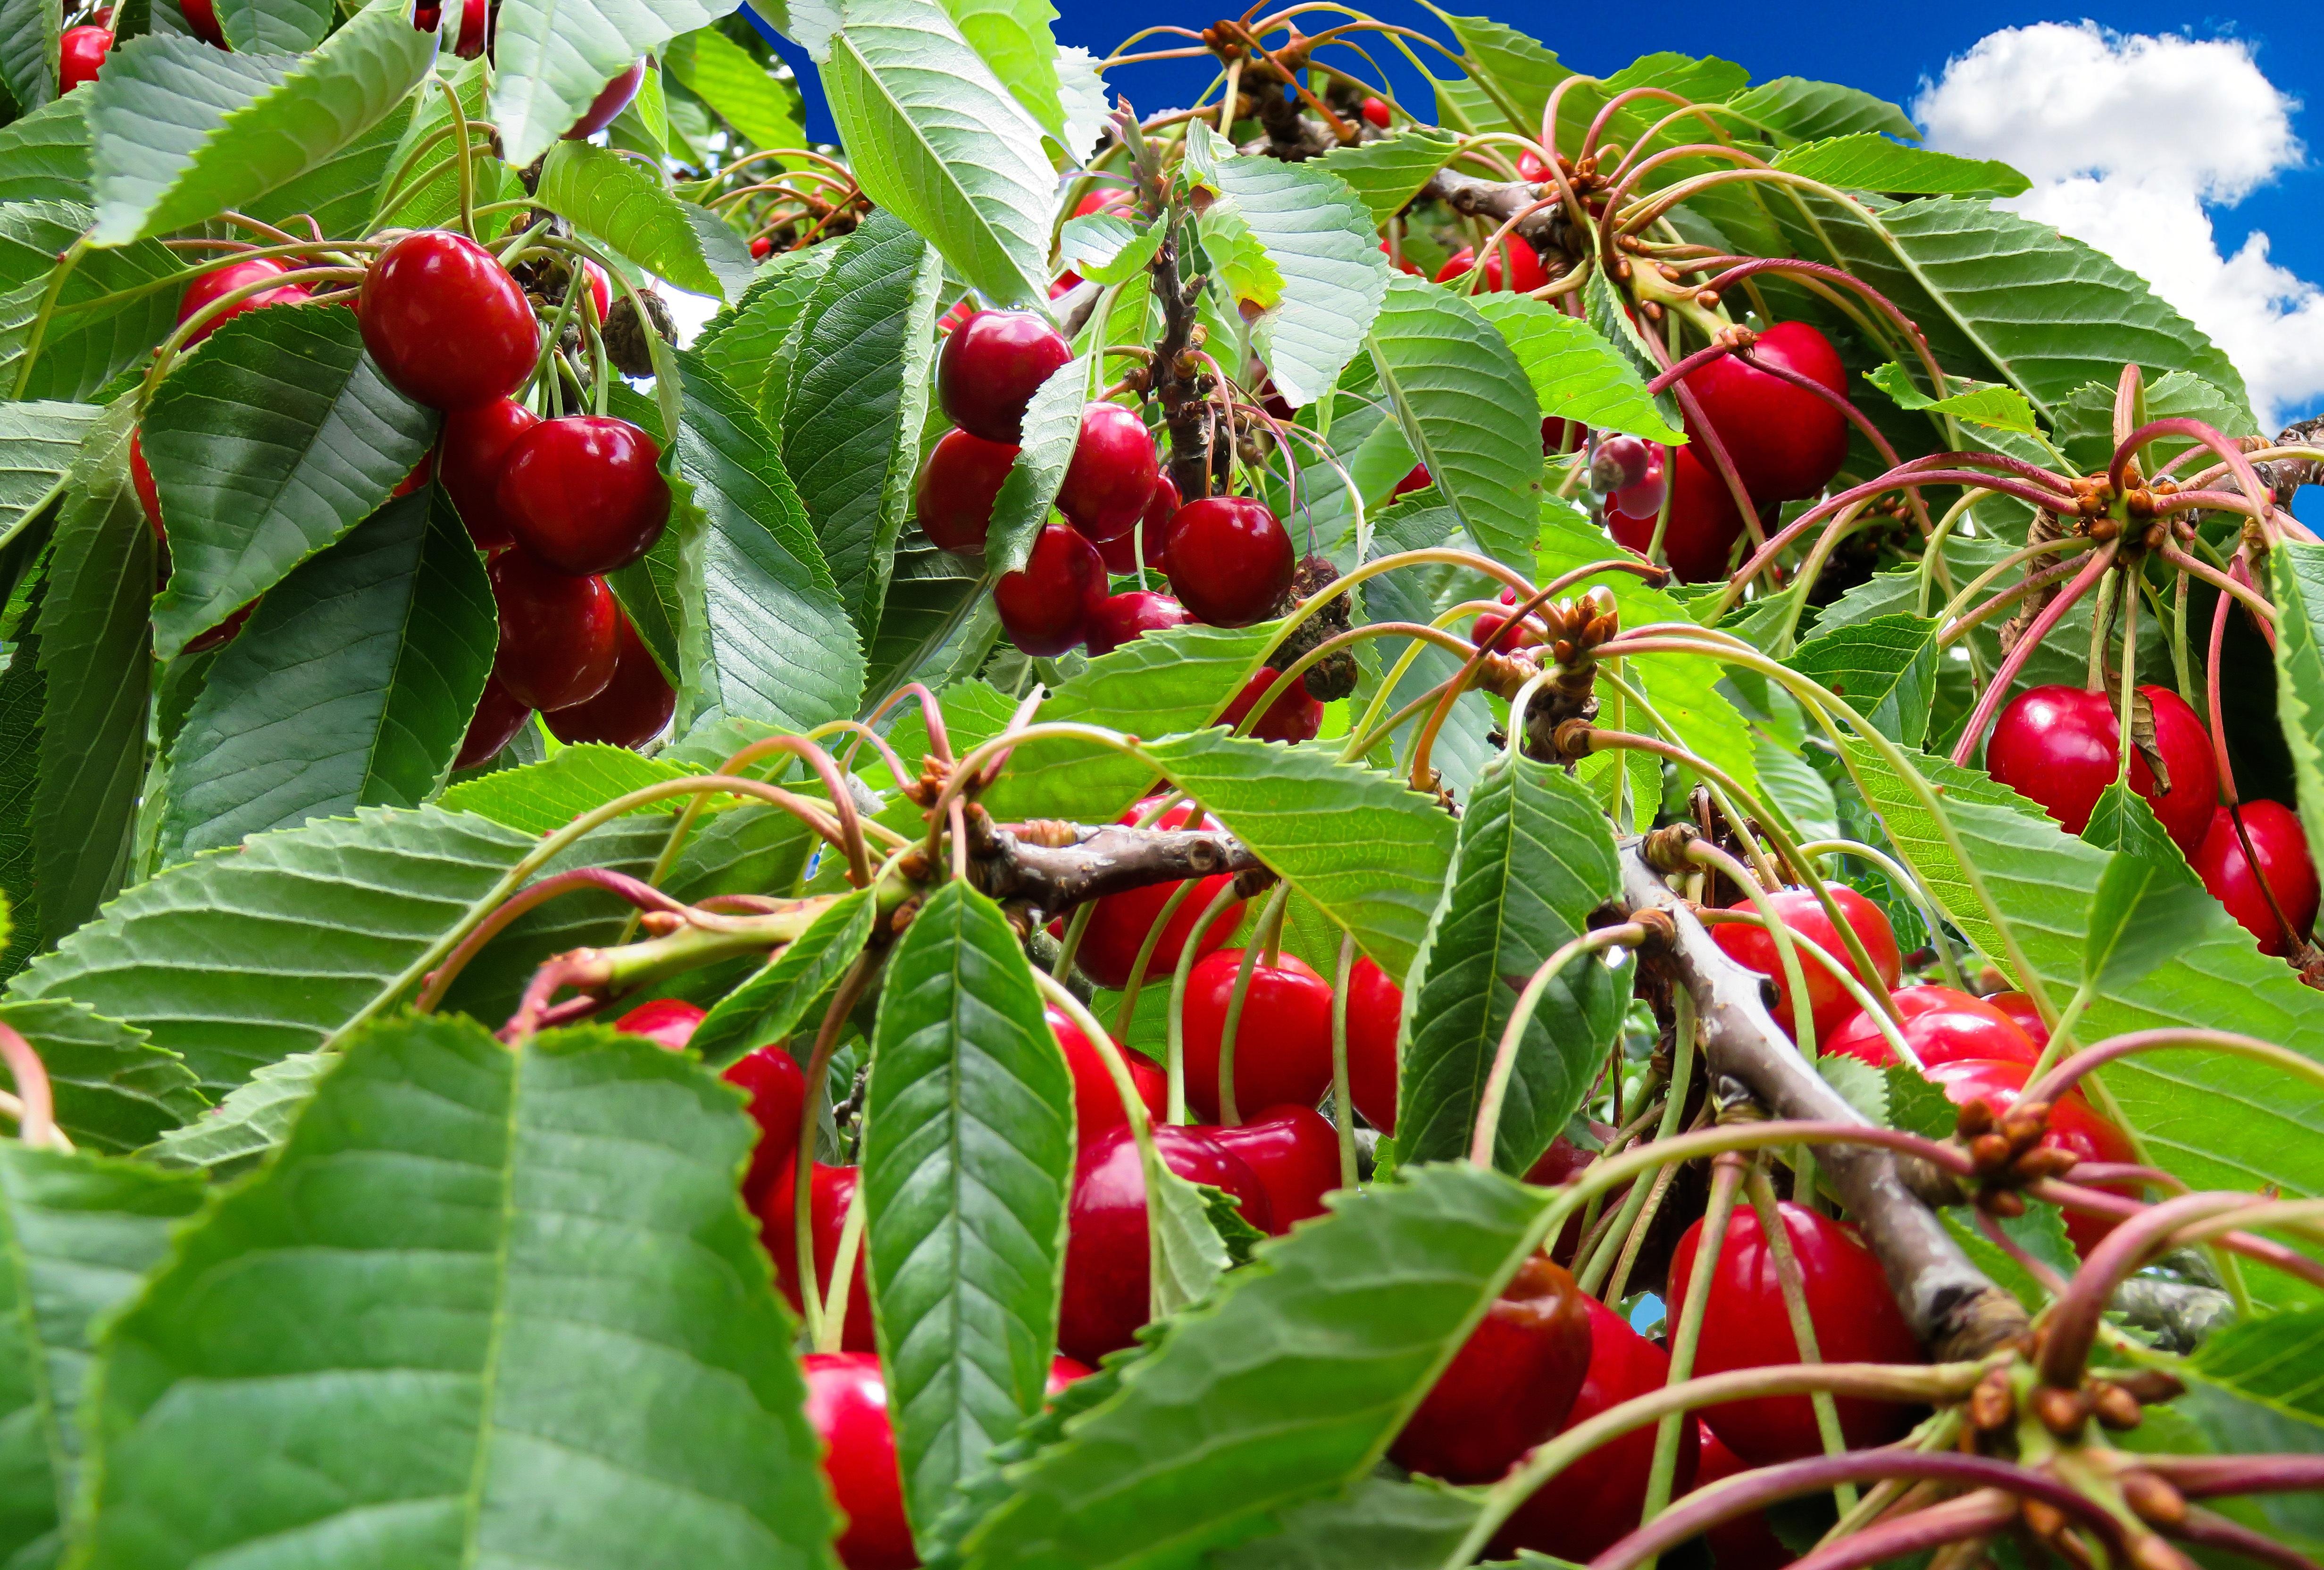 Fotos gratis rbol rama fruta flor p rpura verano for Arbol rojo jardin